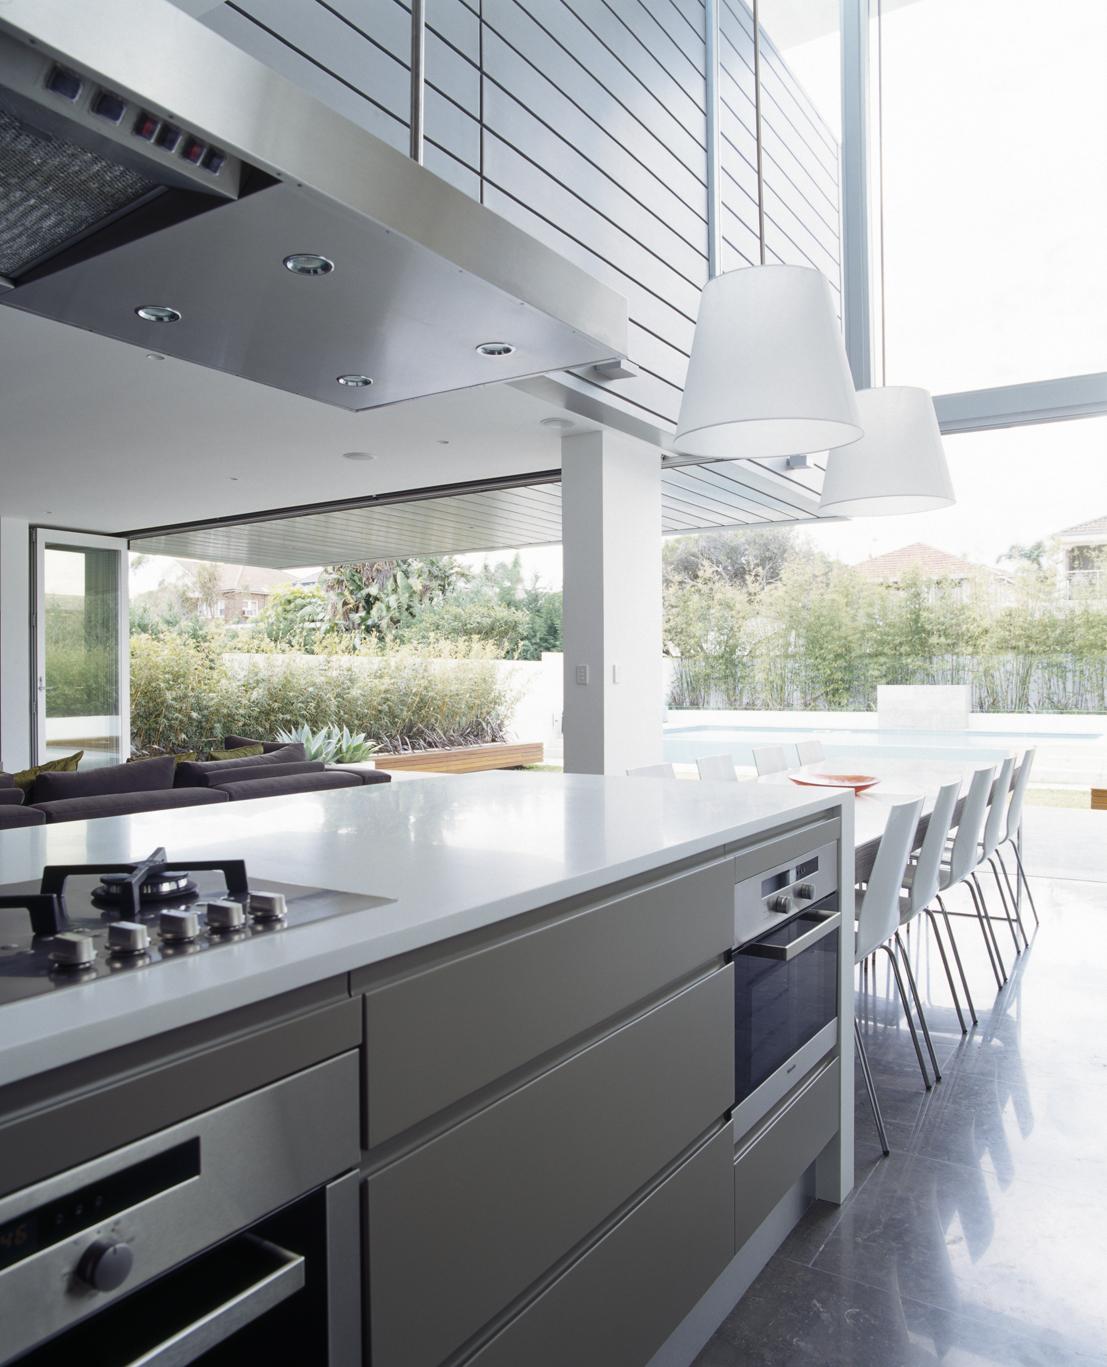 Open Space Kitchen Designs: Minosa: Minosa Kitchen Design. Award Winning Design And